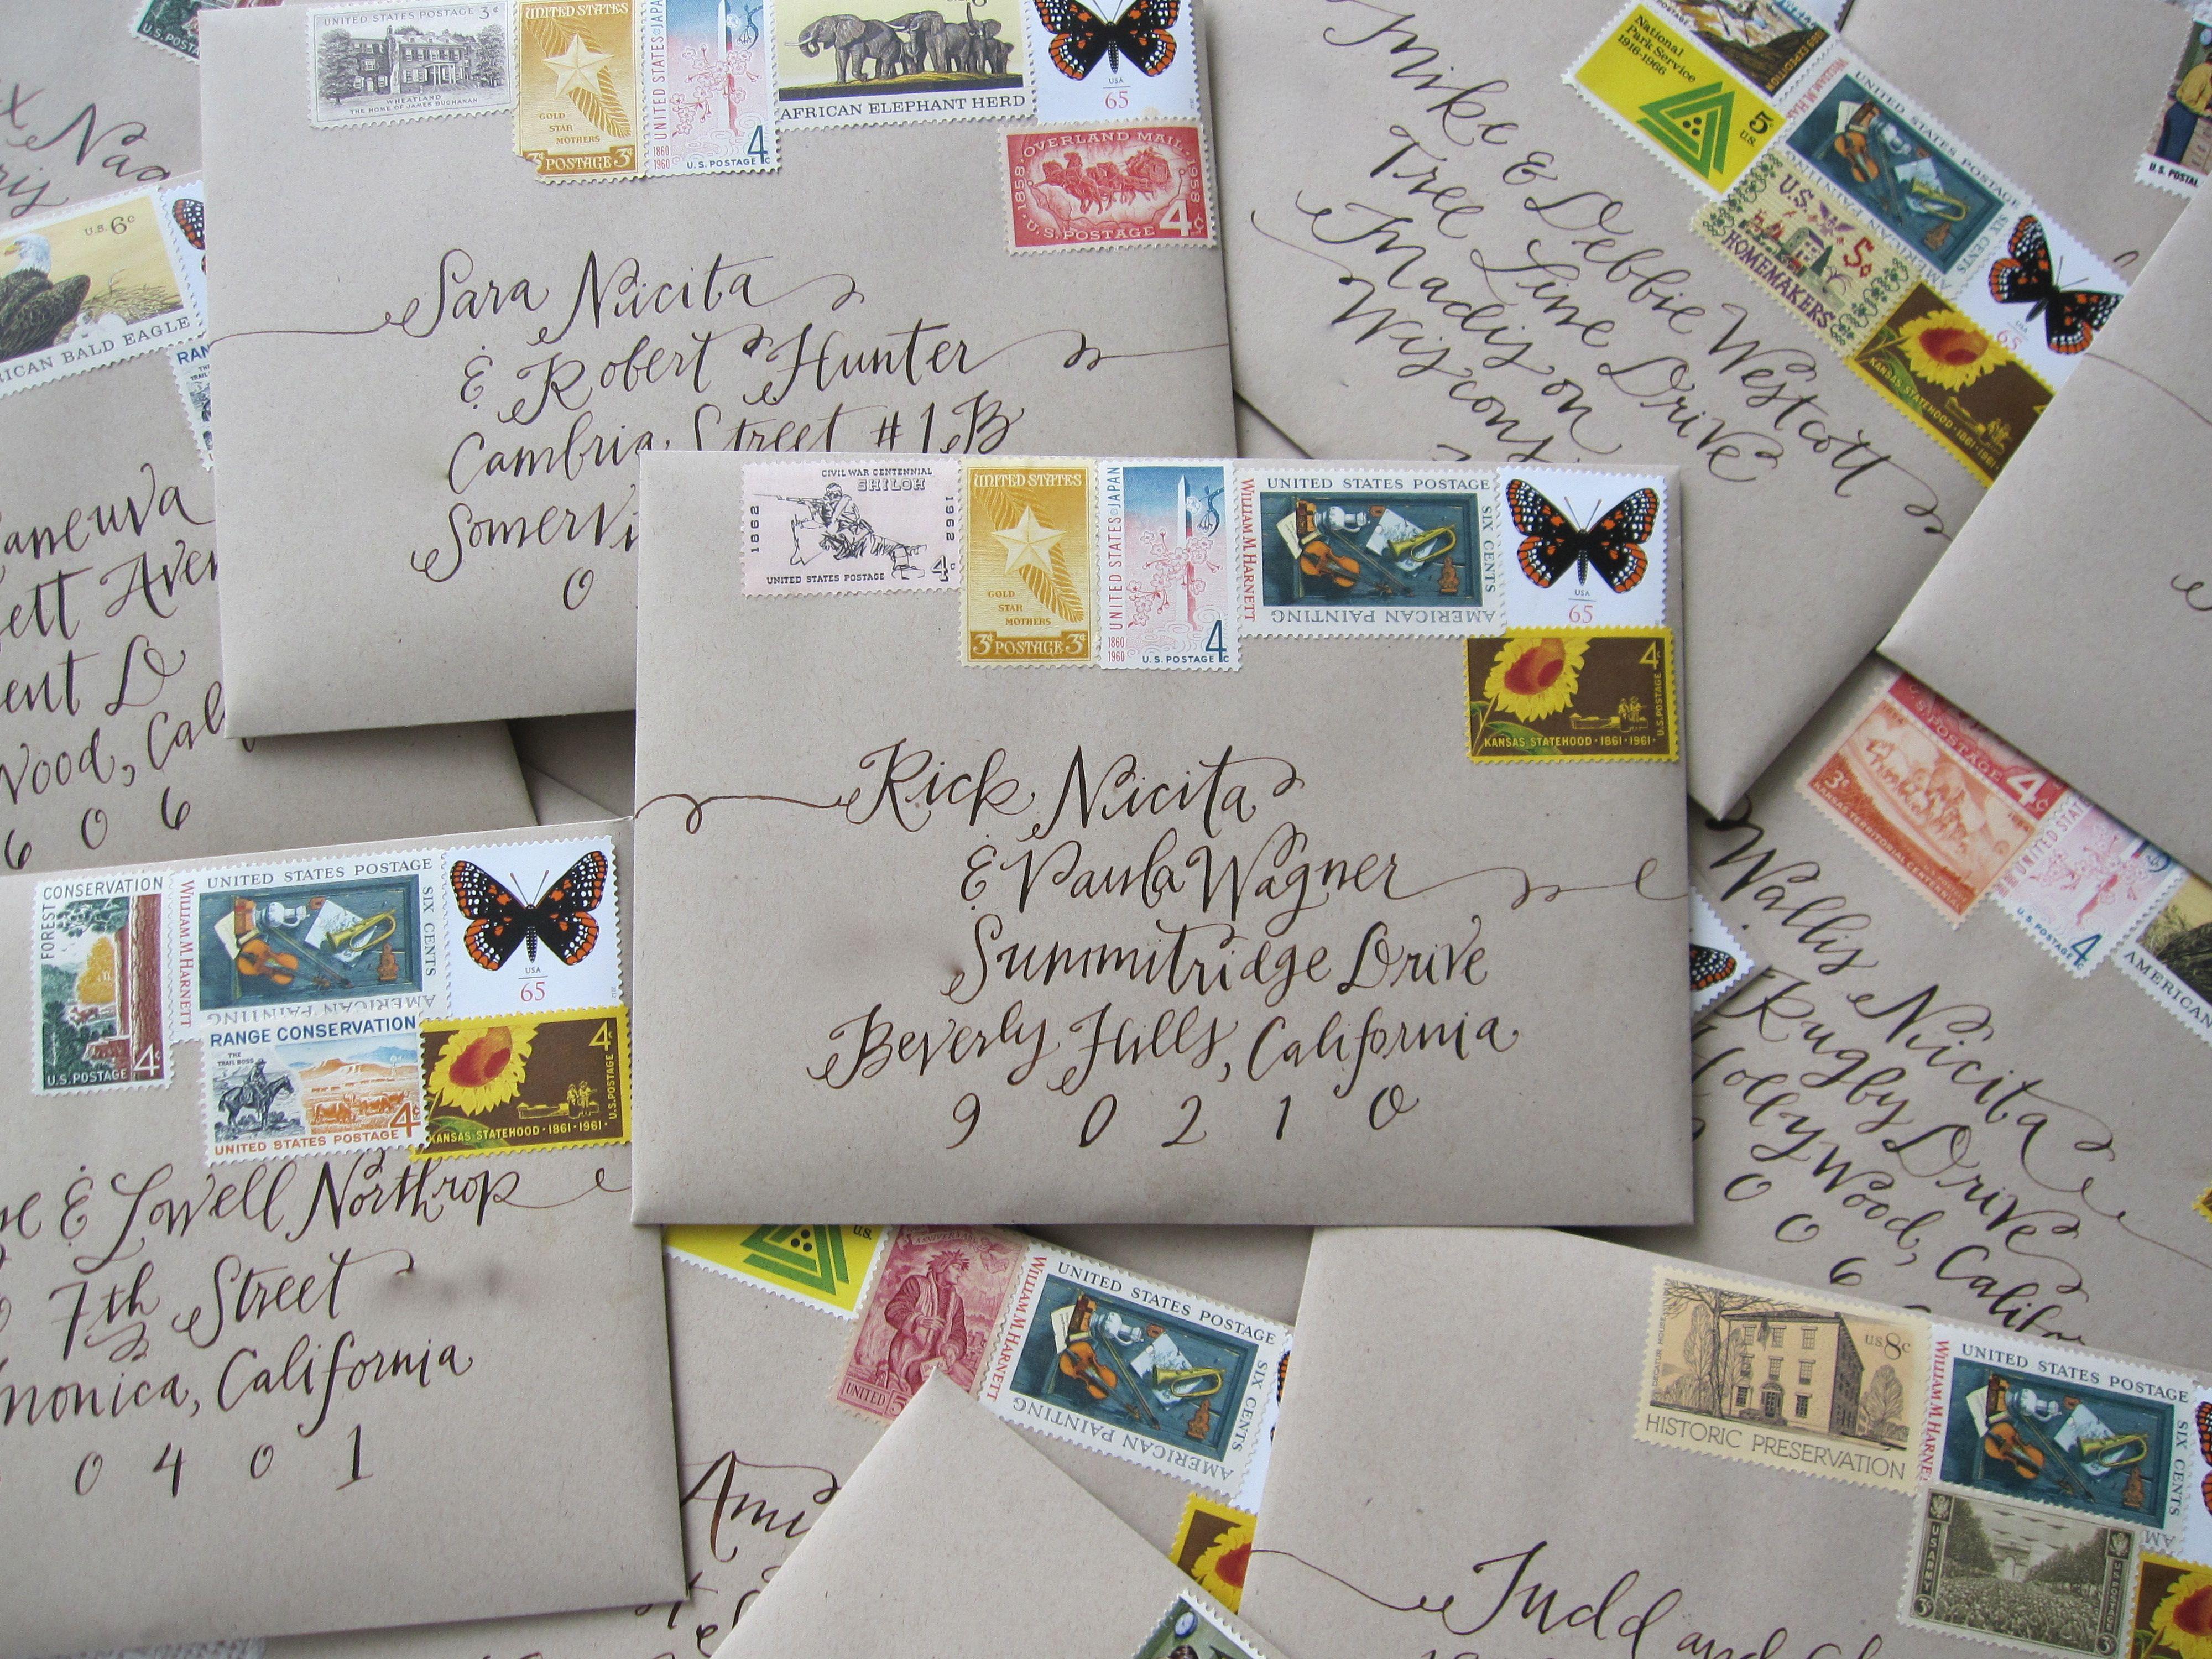 Vintage Stamps For Wedding Invitations: Wedding Invite Envelopes With Vintage Stamps